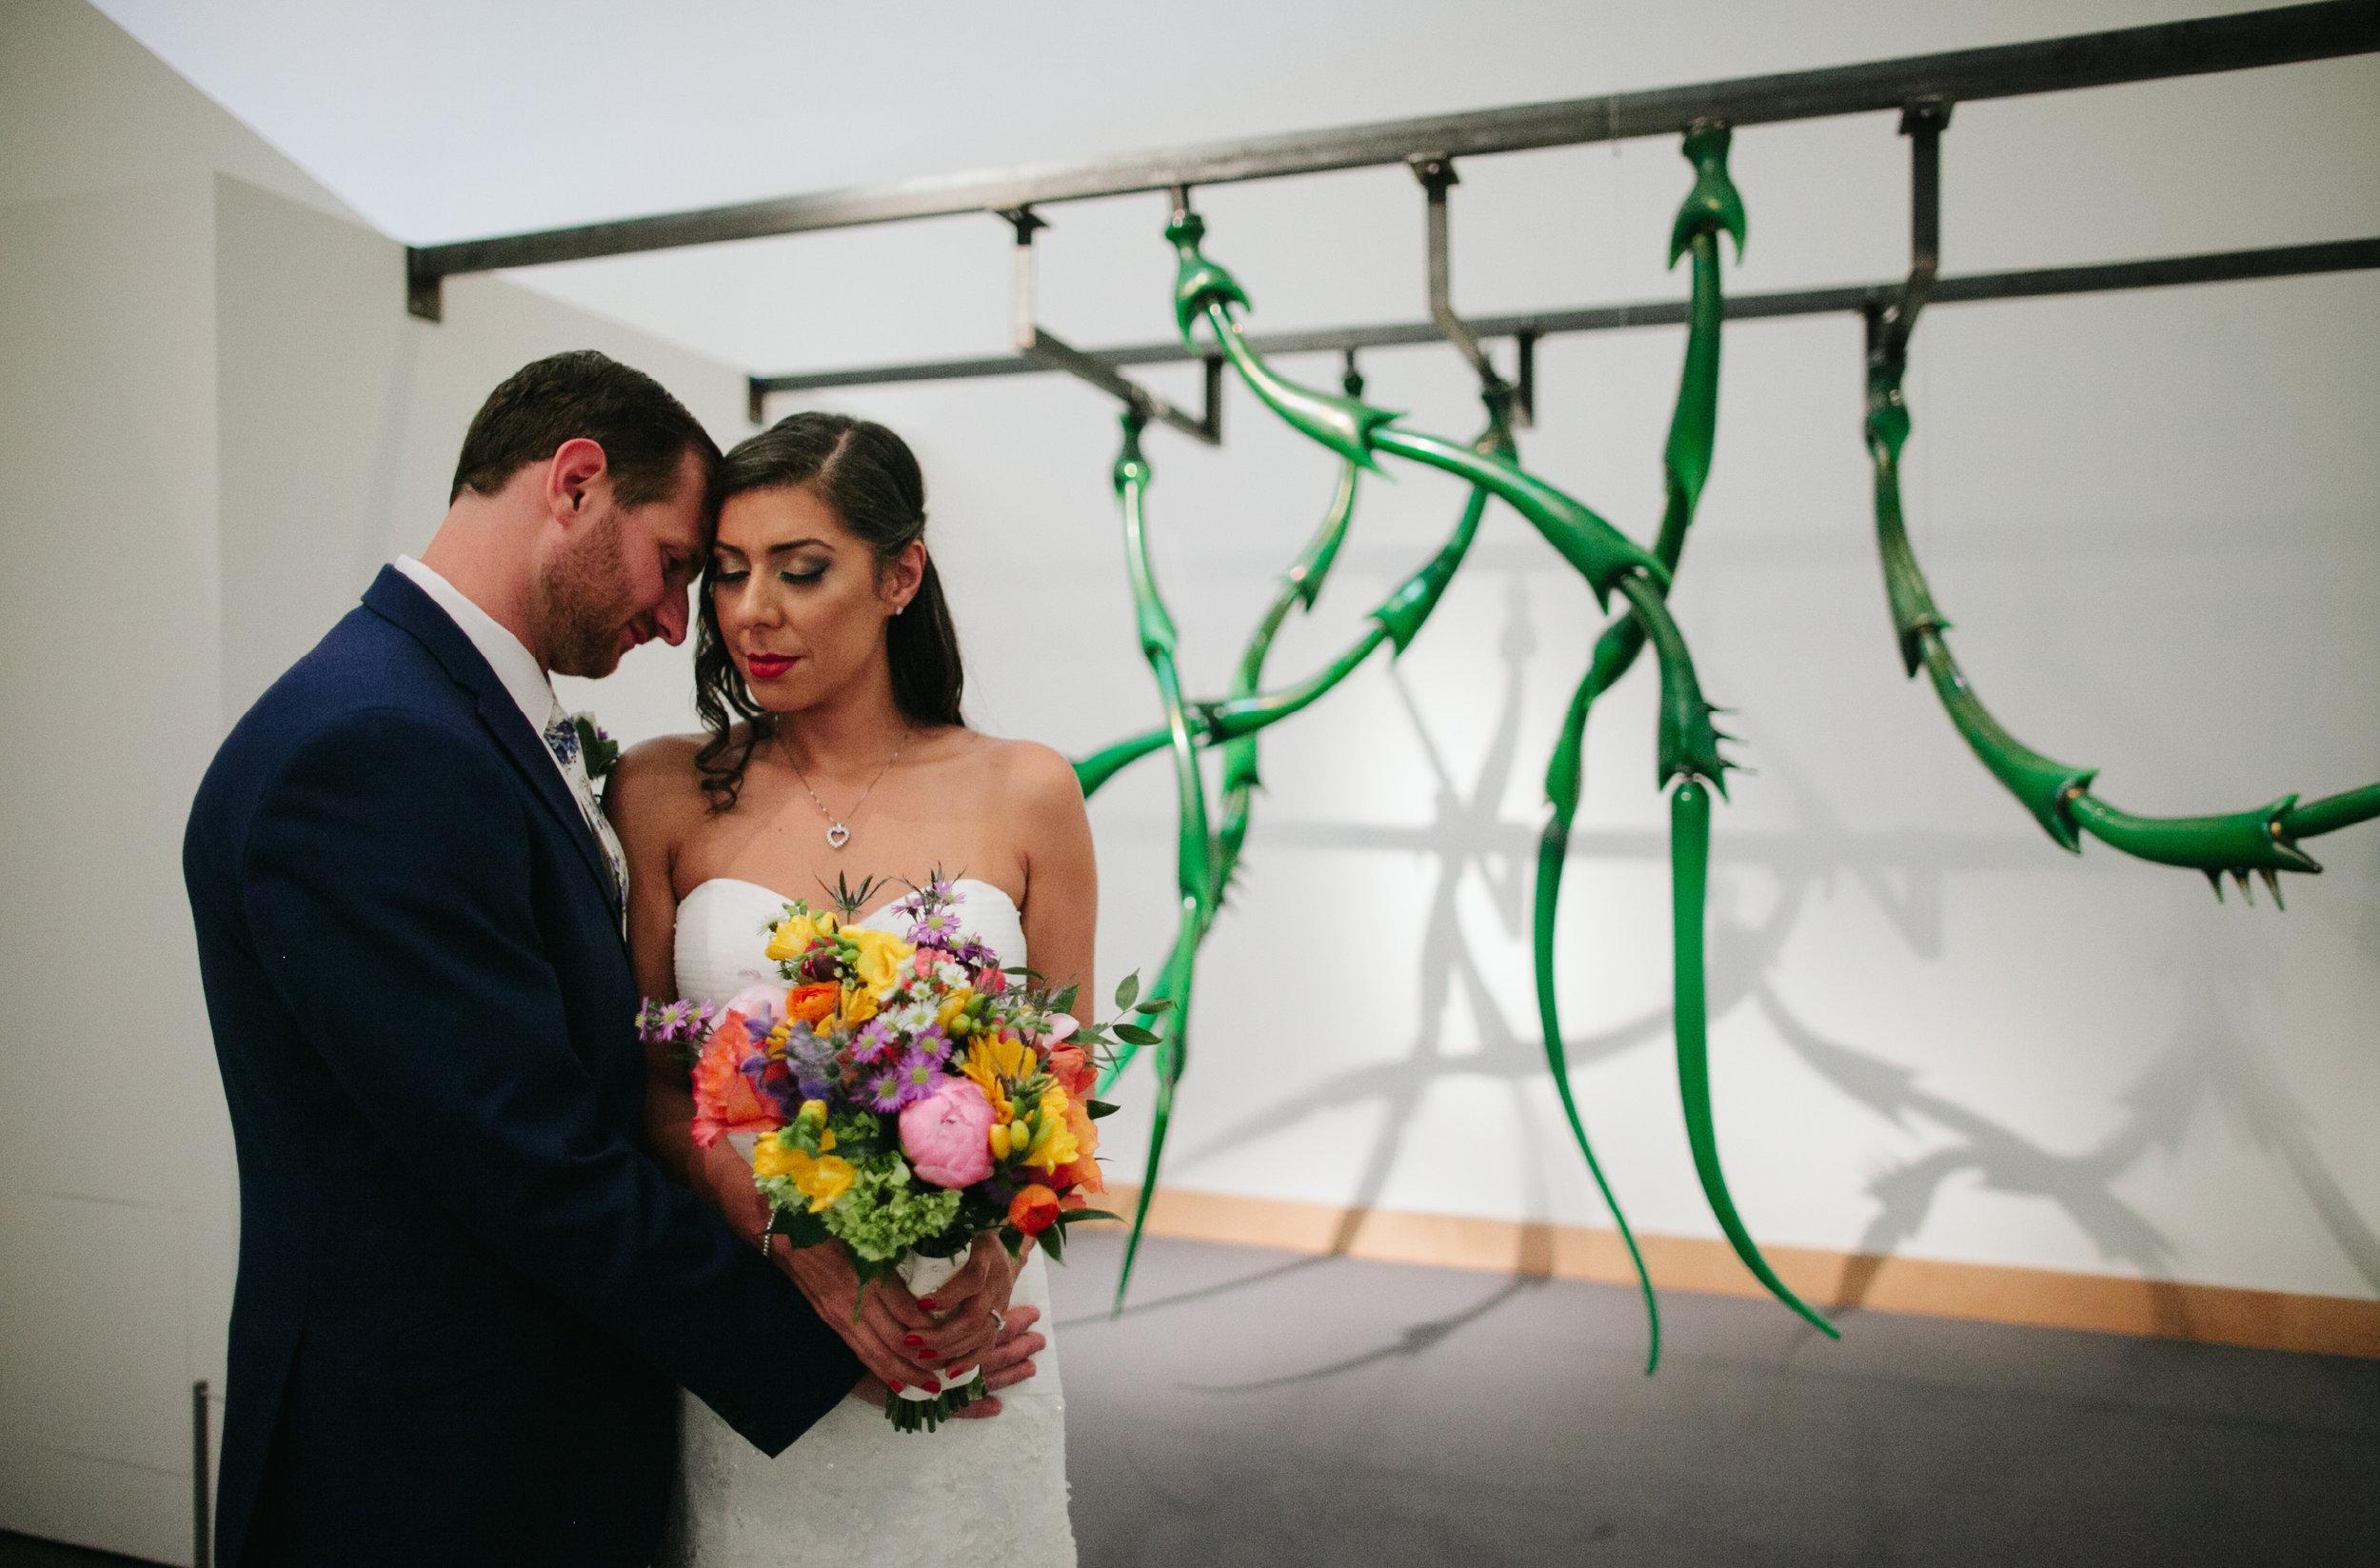 Museum Wedding at the Boca Raton Museum8.jpg